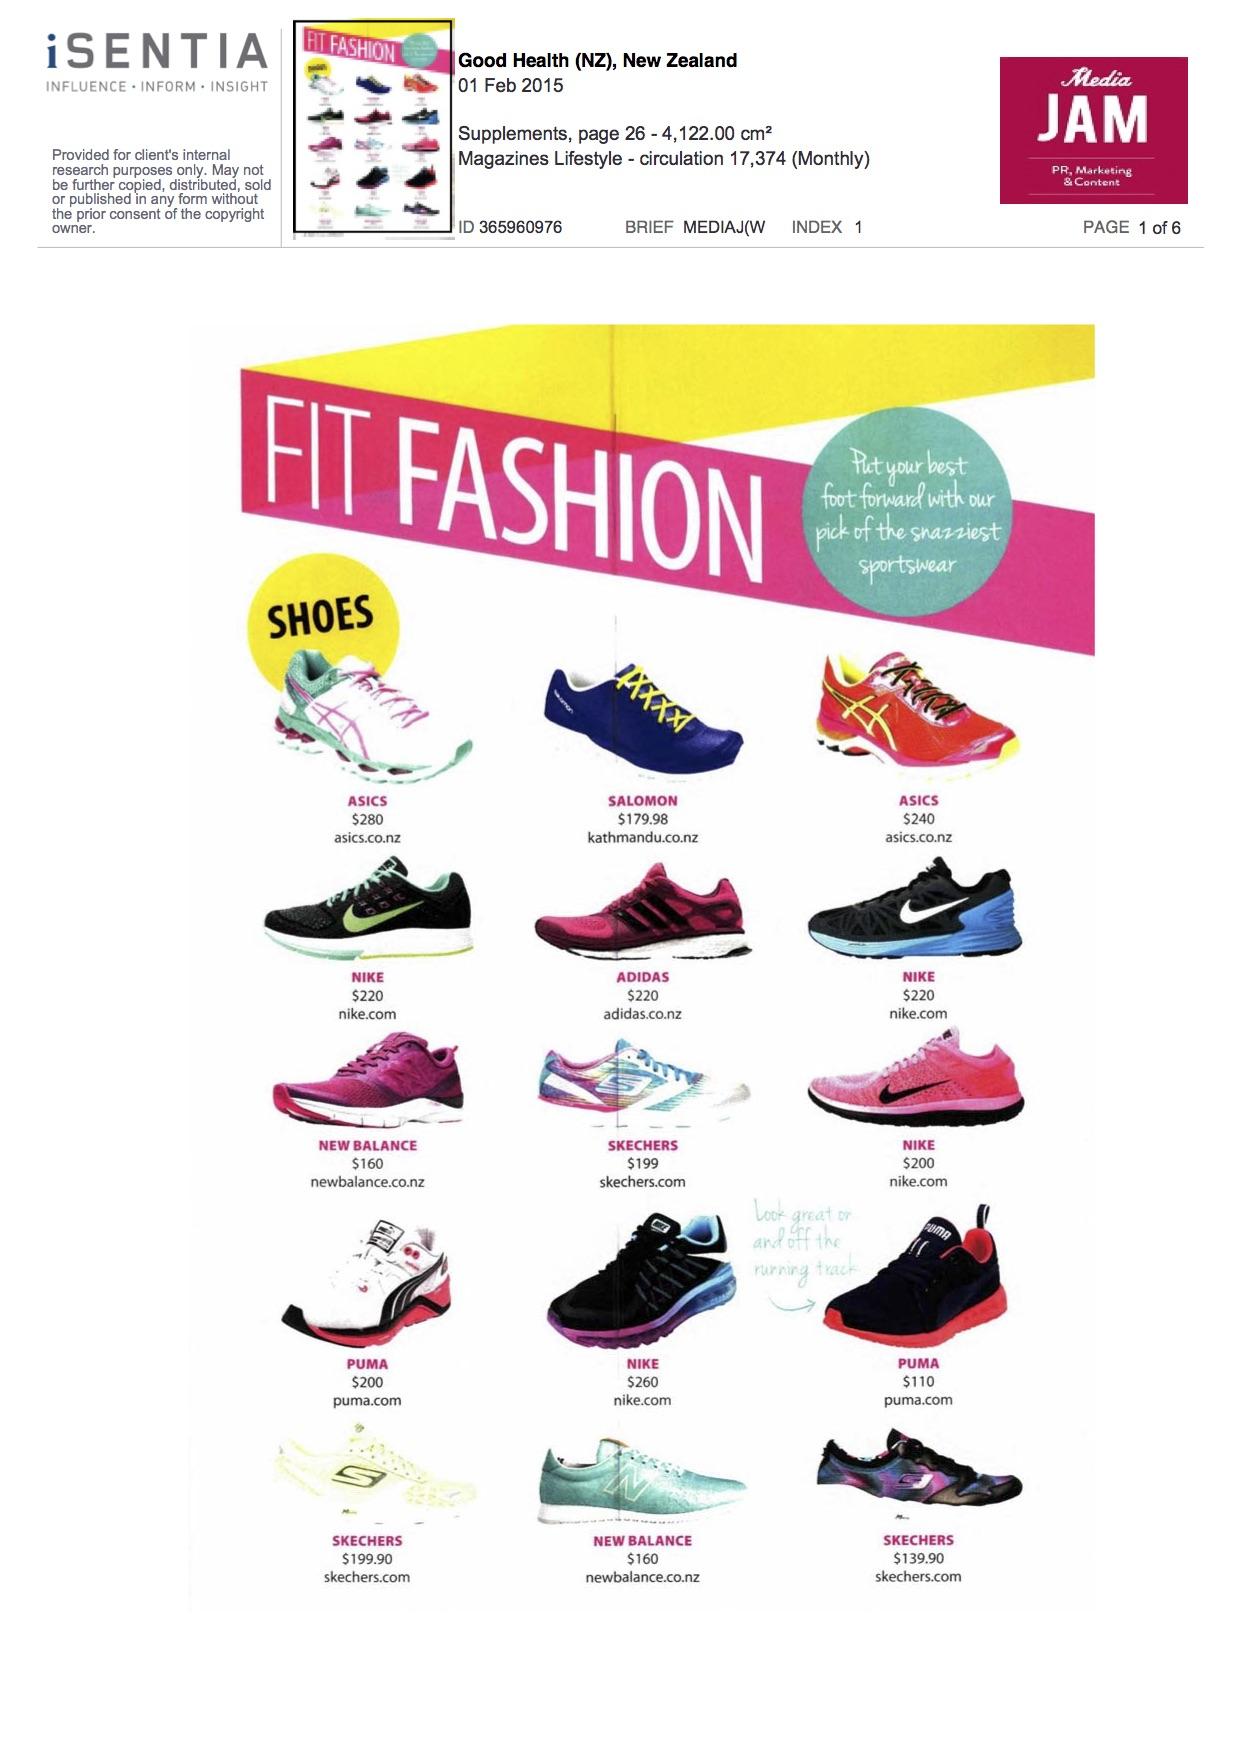 Good Health Magazine Feb 2015 Fit Fashion Featuring New Balance.jpg